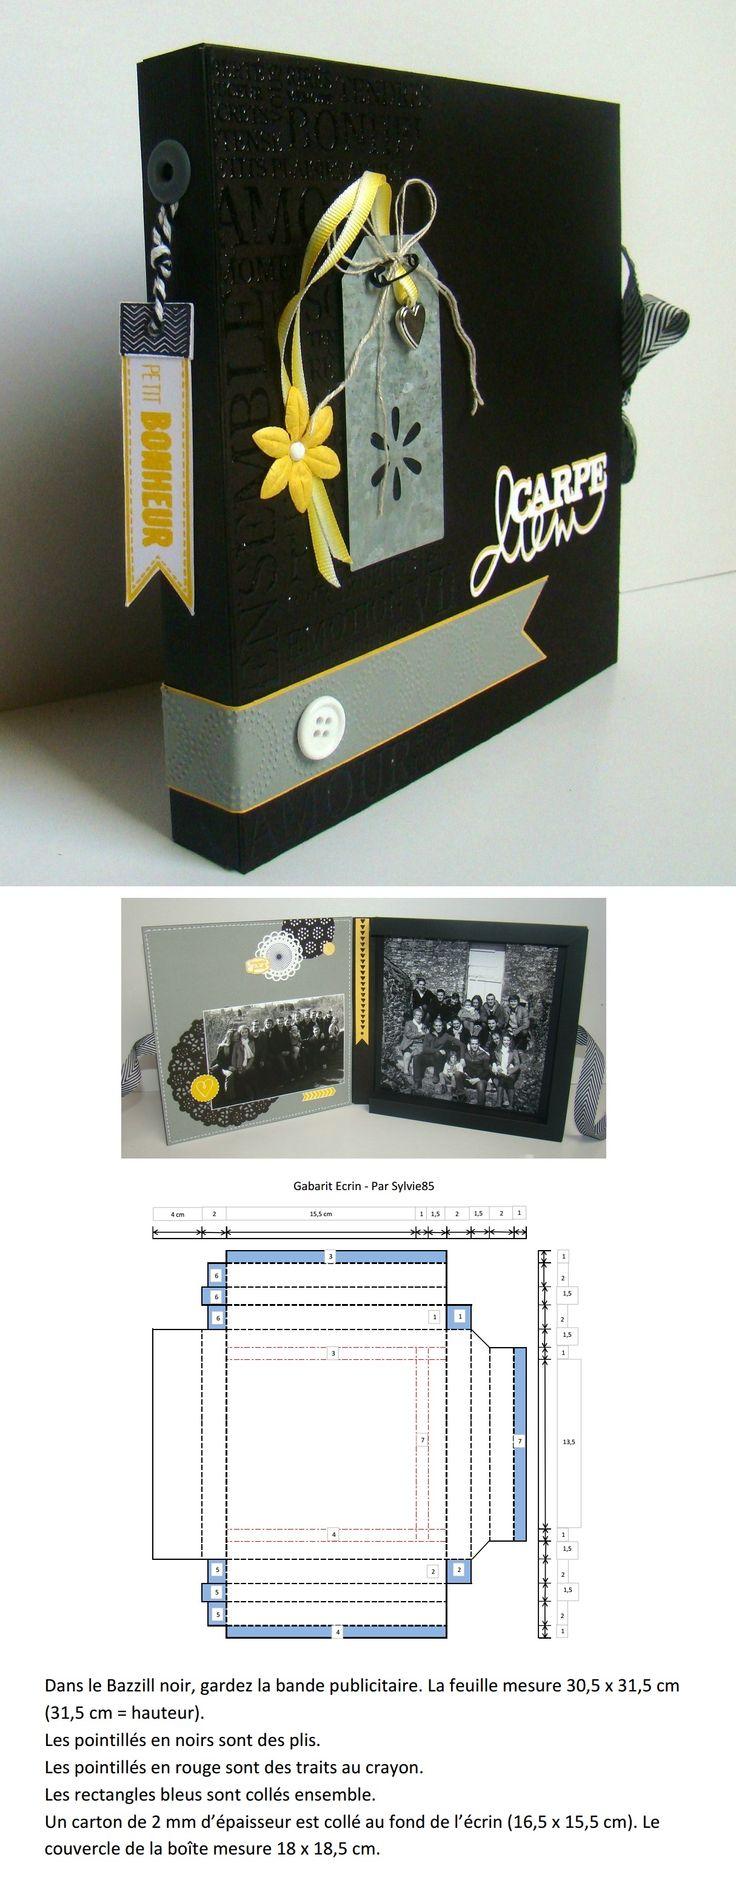 190 best images about 05 enveloppe pochette boite on pinterest. Black Bedroom Furniture Sets. Home Design Ideas